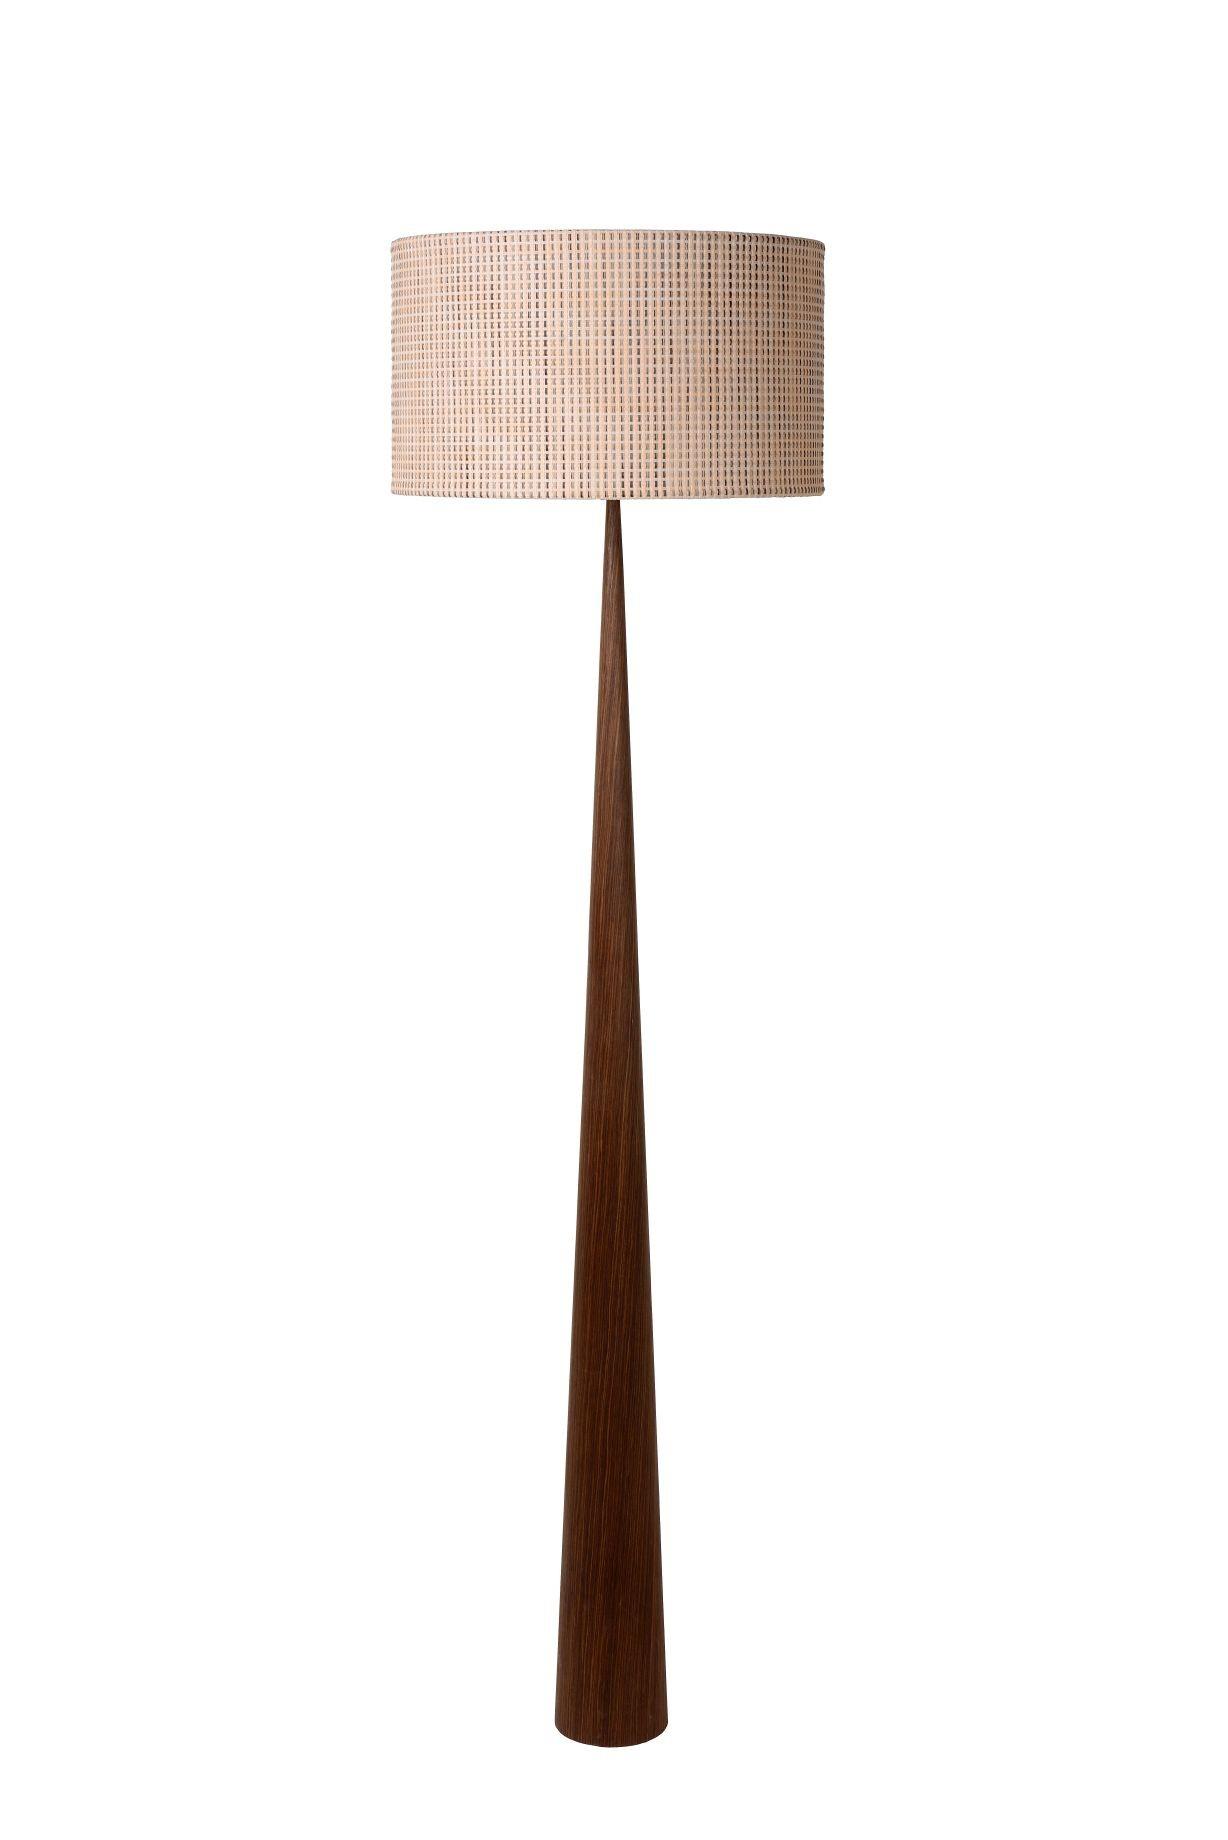 Stehlampe Skandinavisch Holz Caseconrad Com